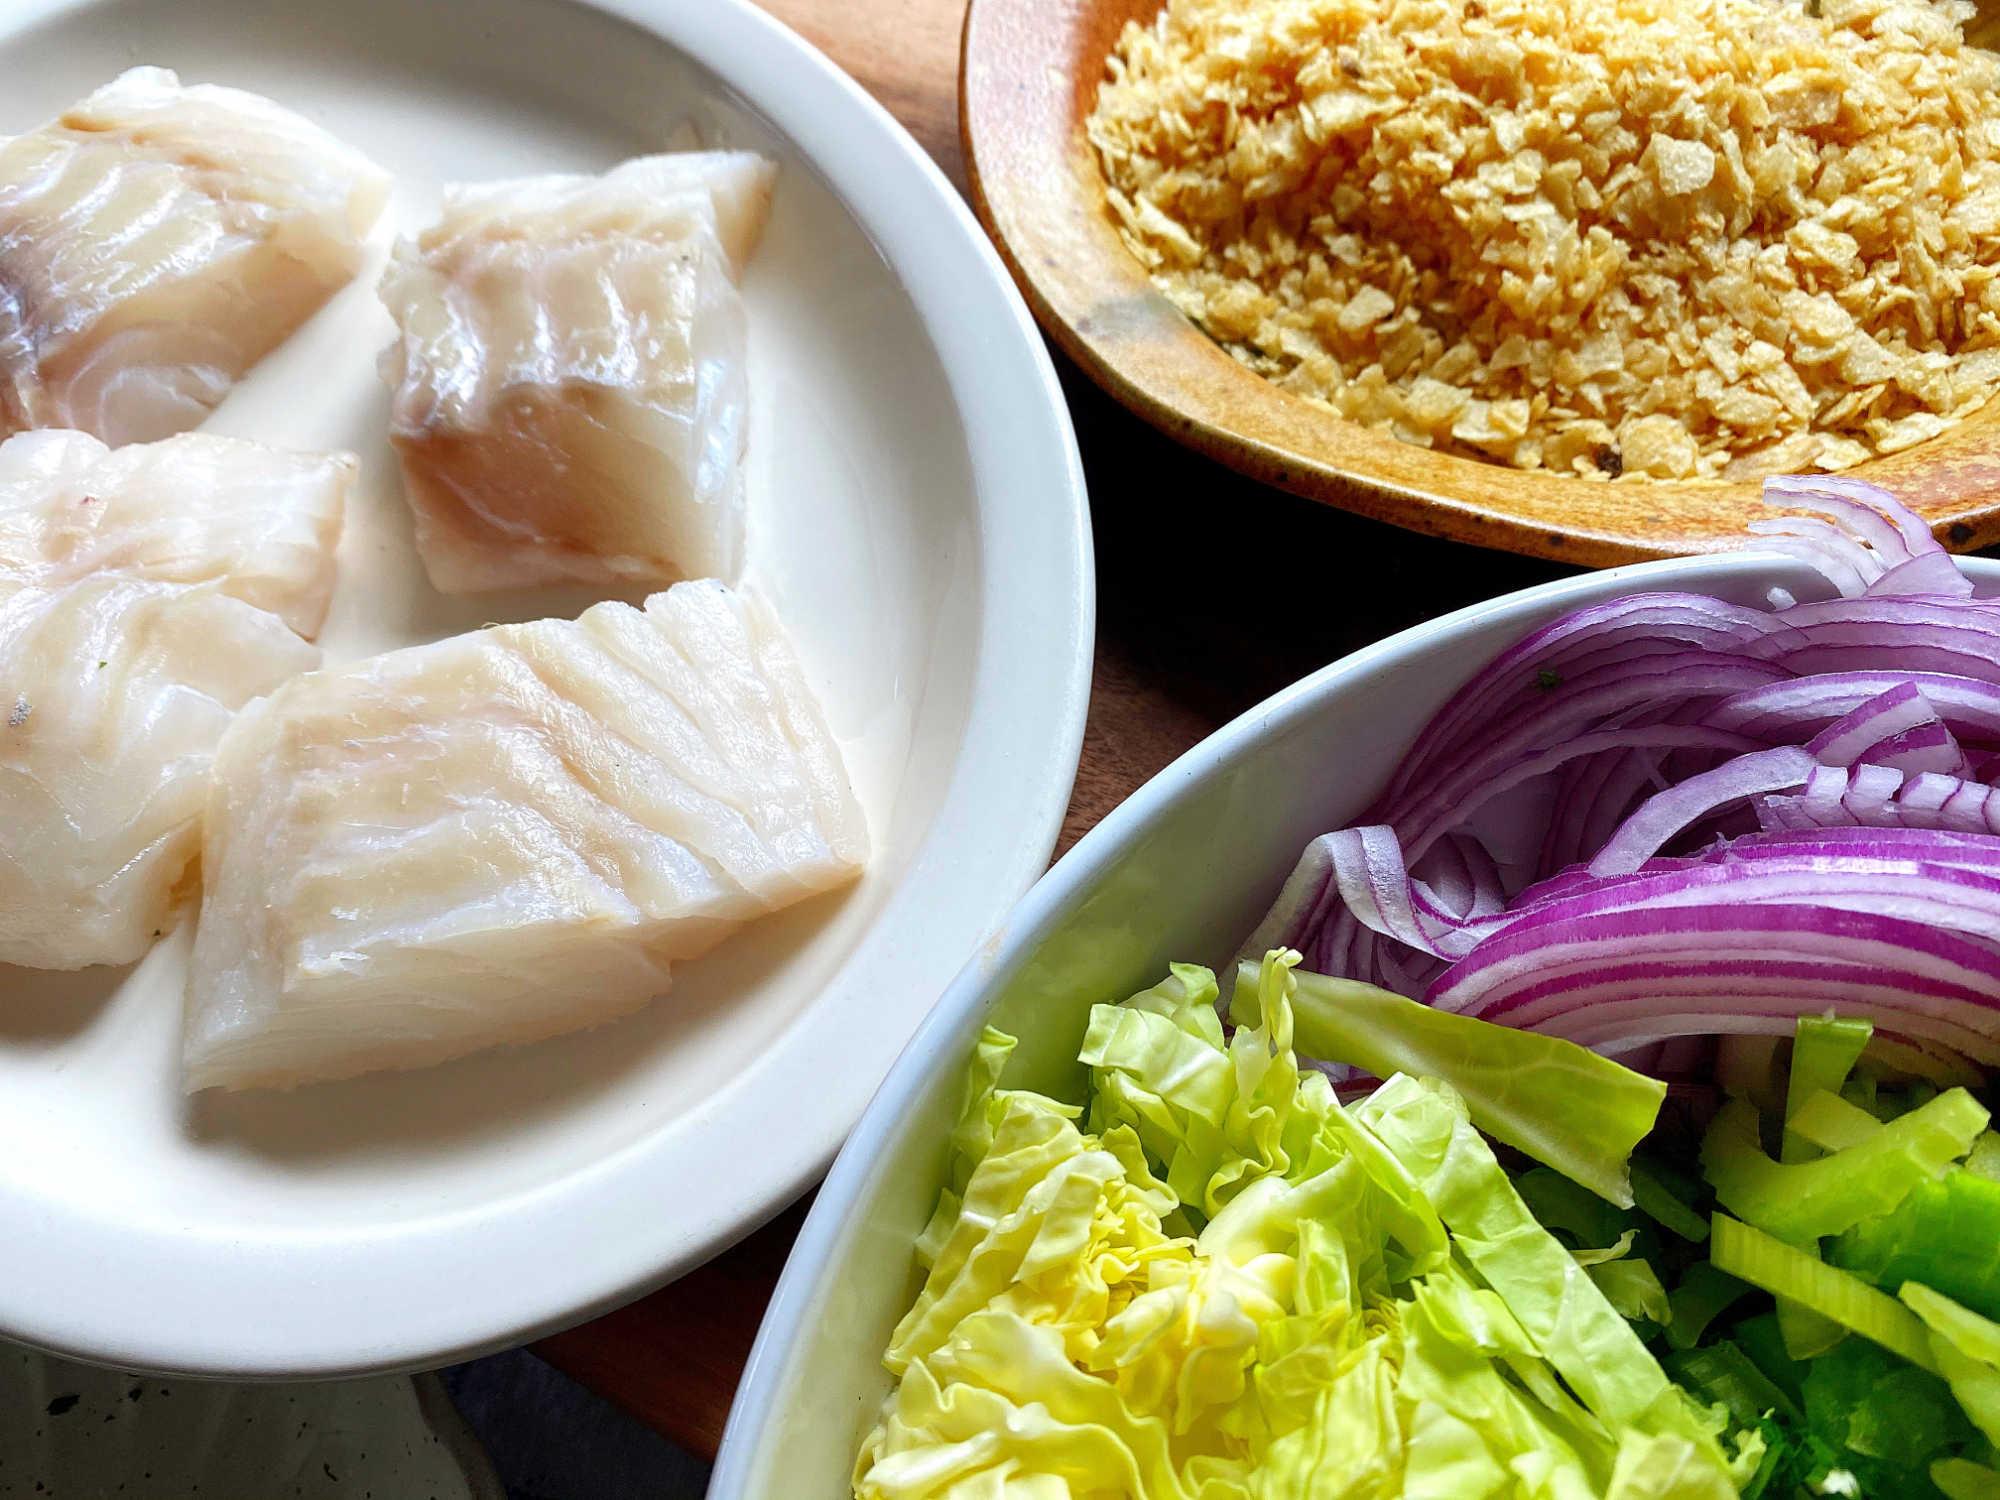 raw cod ingredients